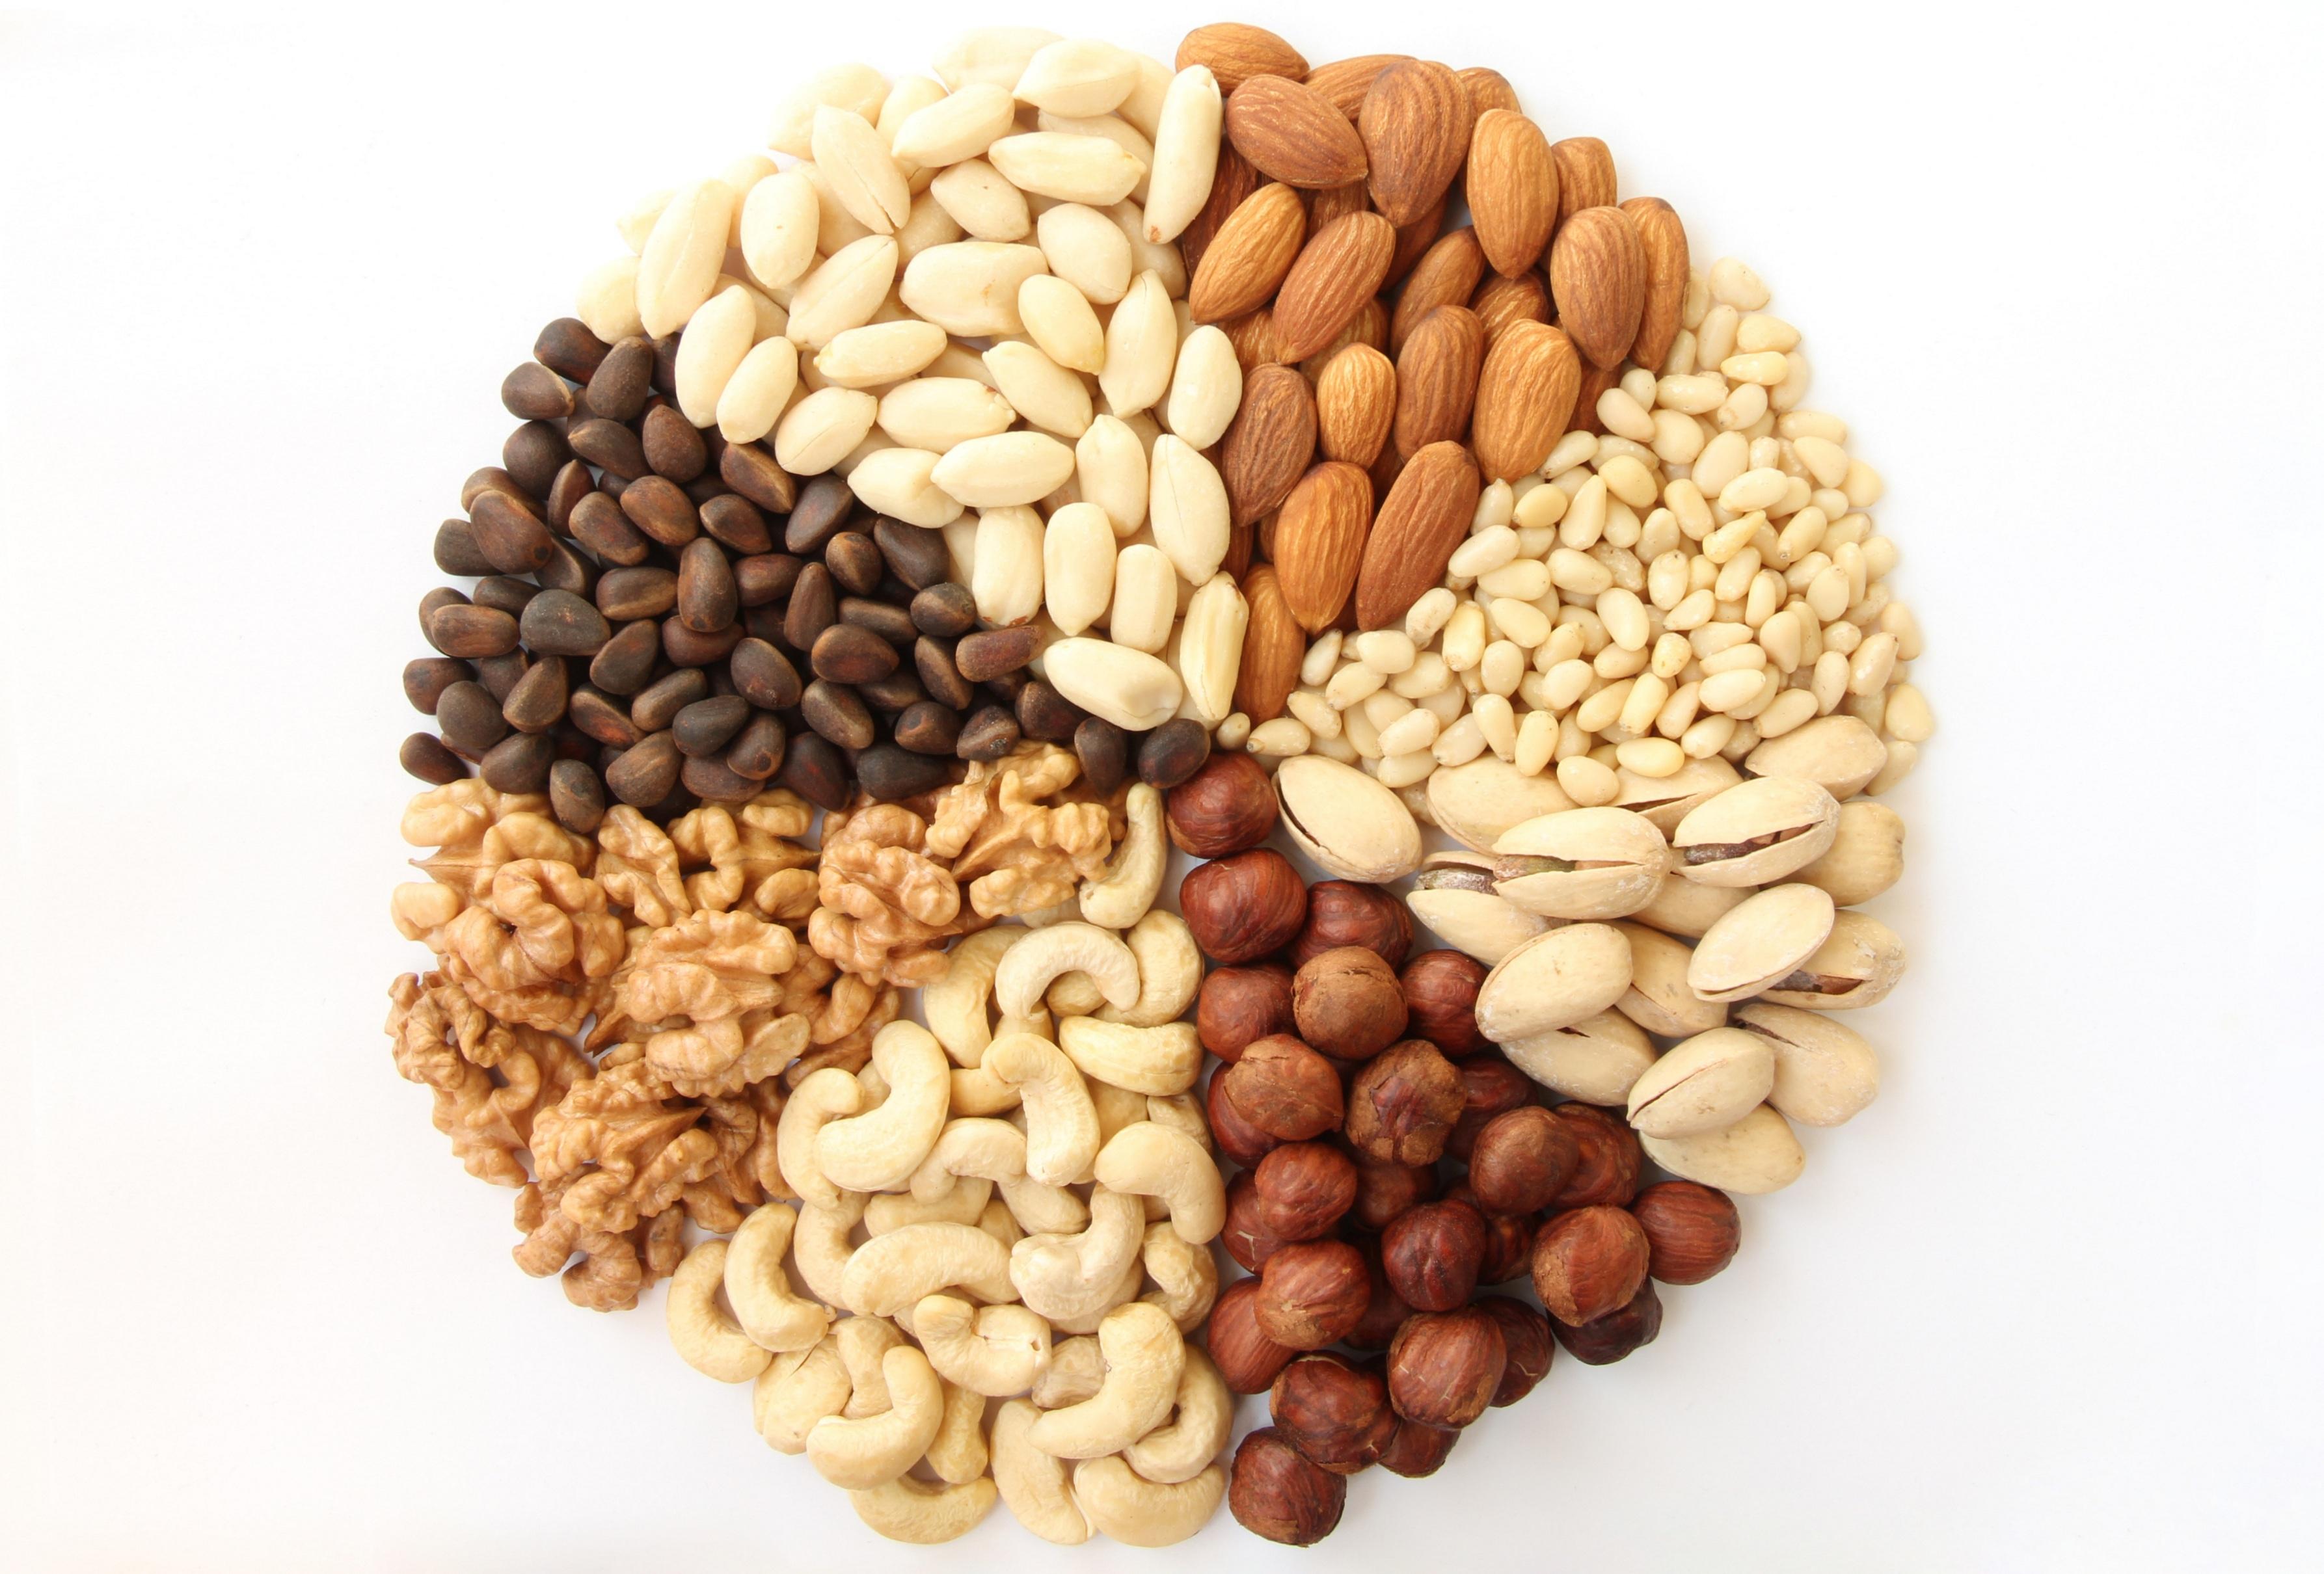 Almonds-and-walnuts